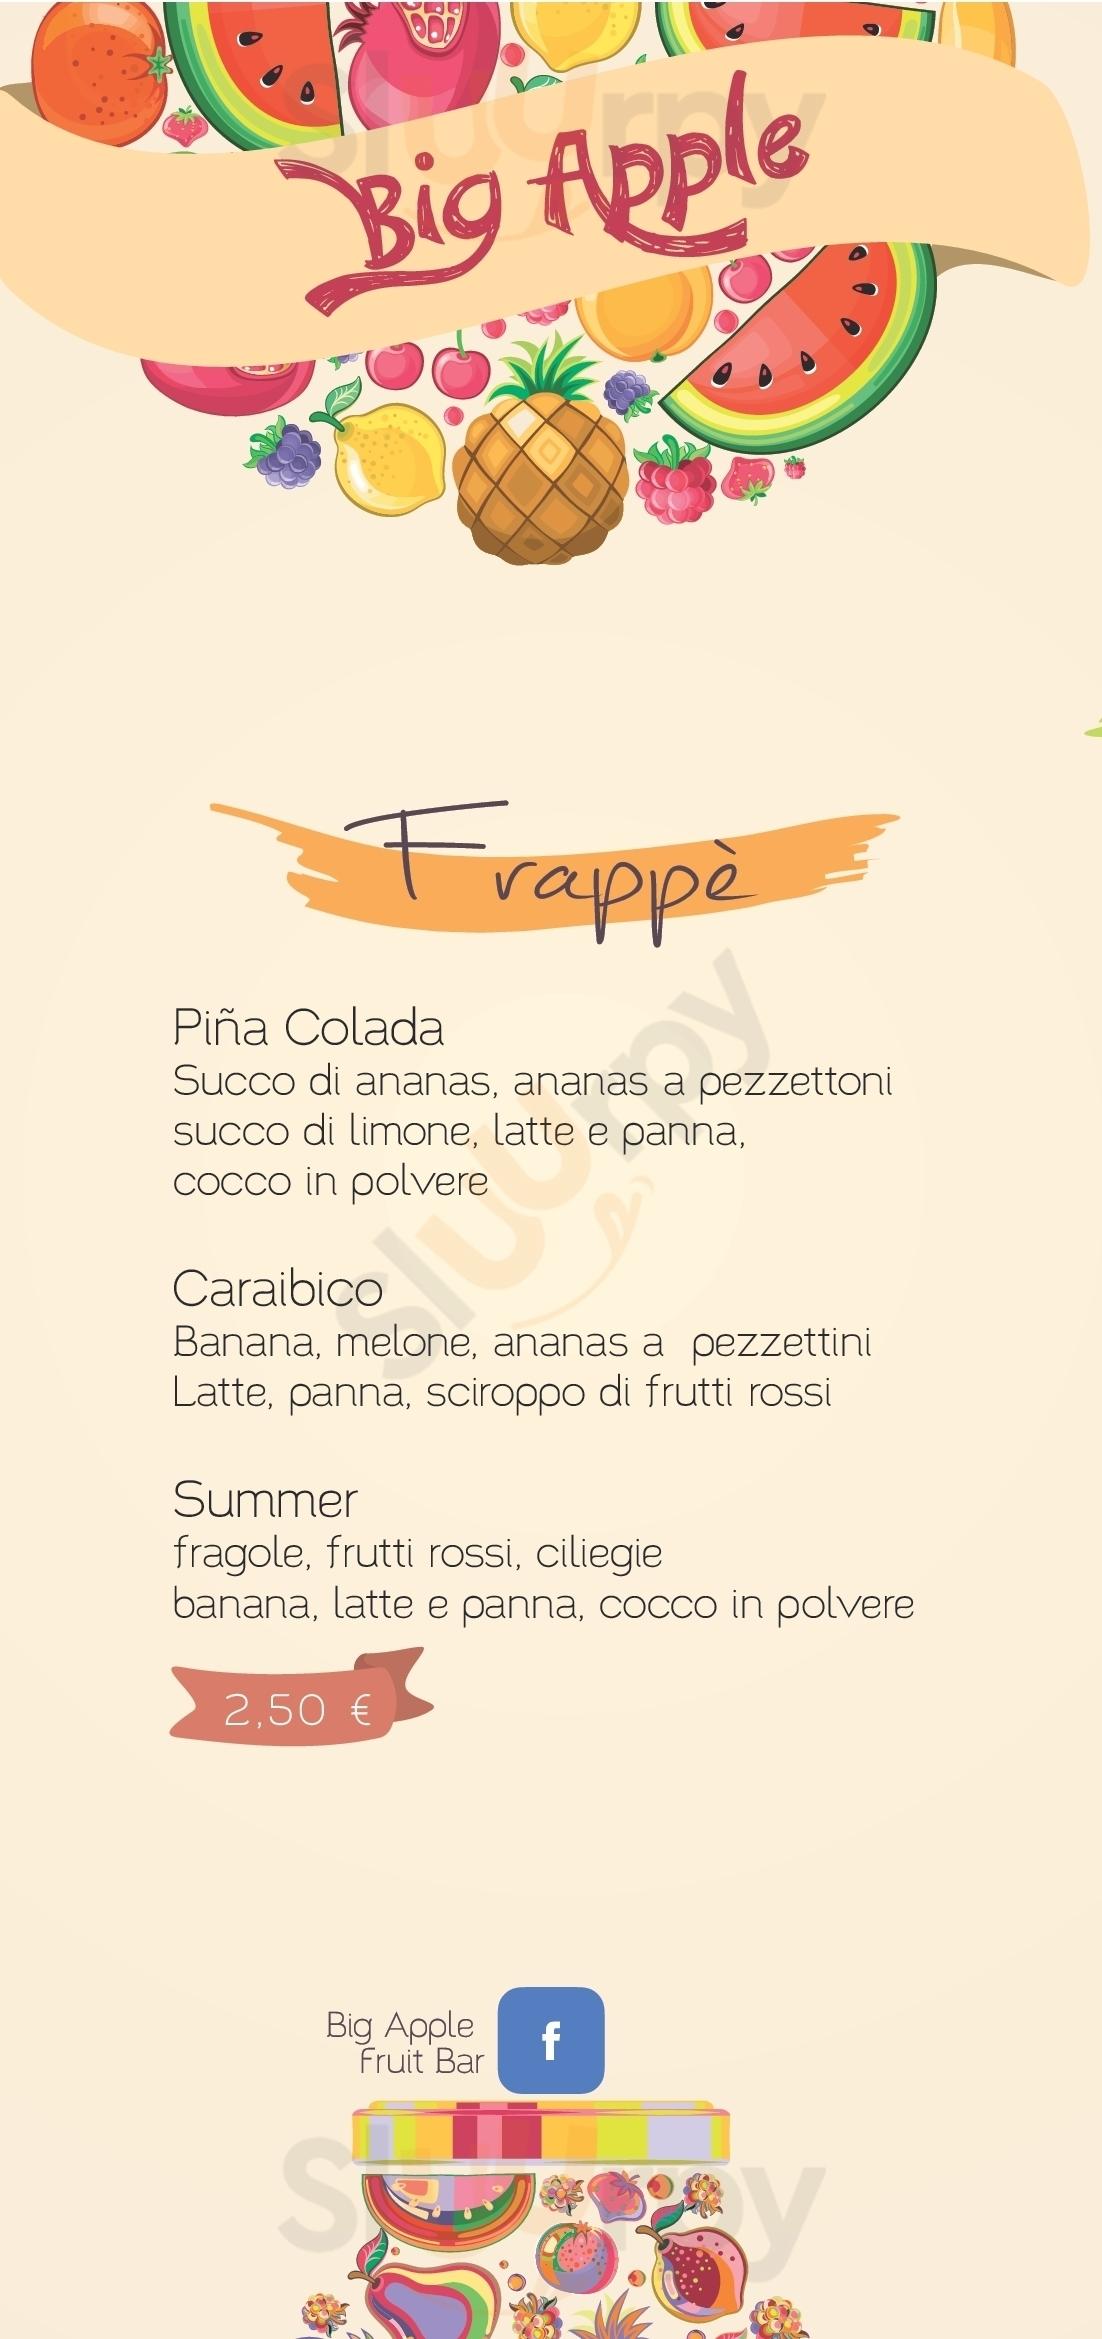 Big Apple Fruit Bar Corato menù 1 pagina